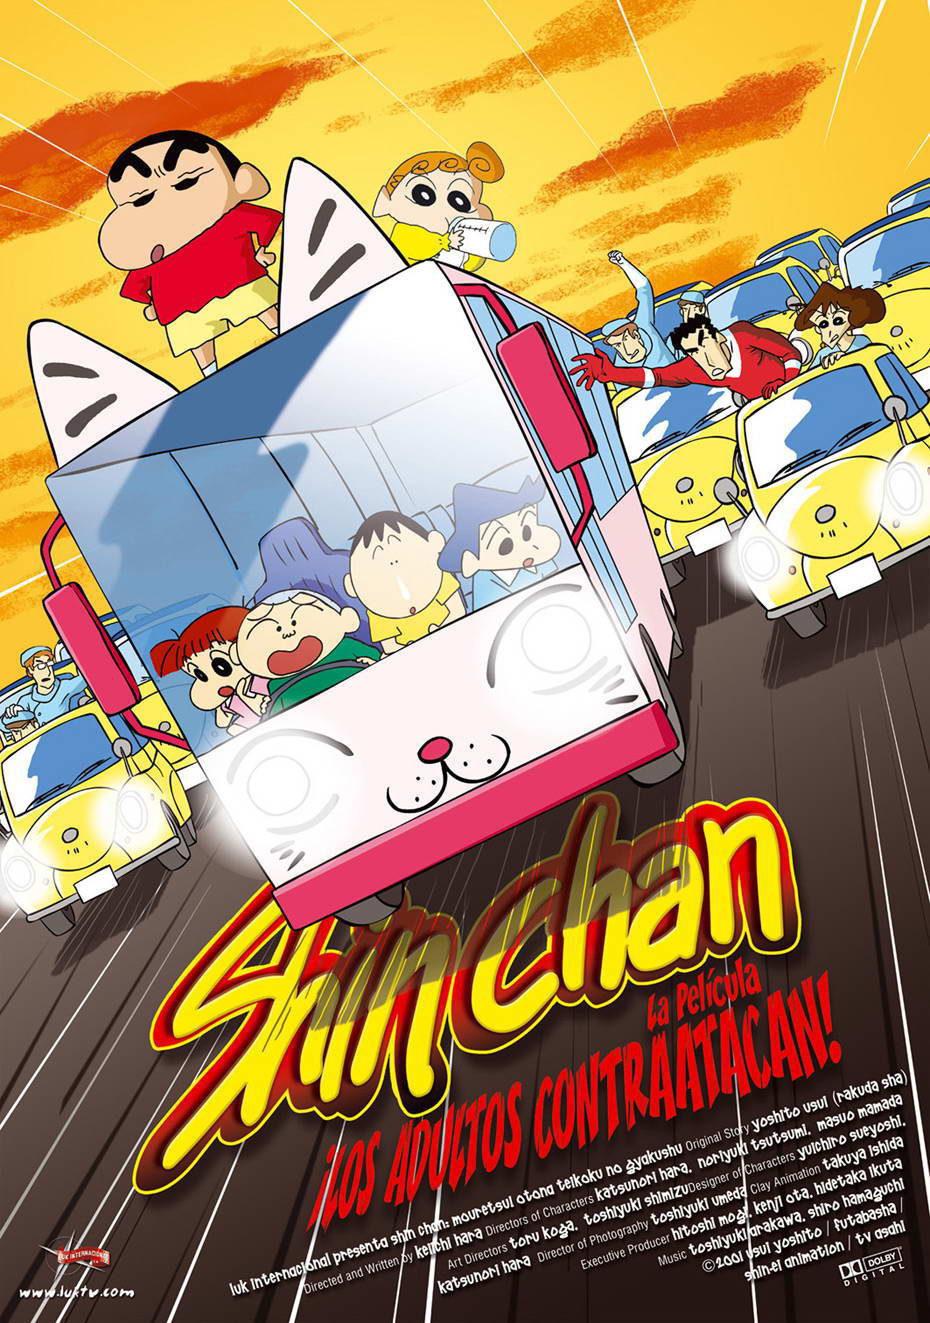 Cartel España de 'Shin Chan: ¡Los adultos contraatacan!'